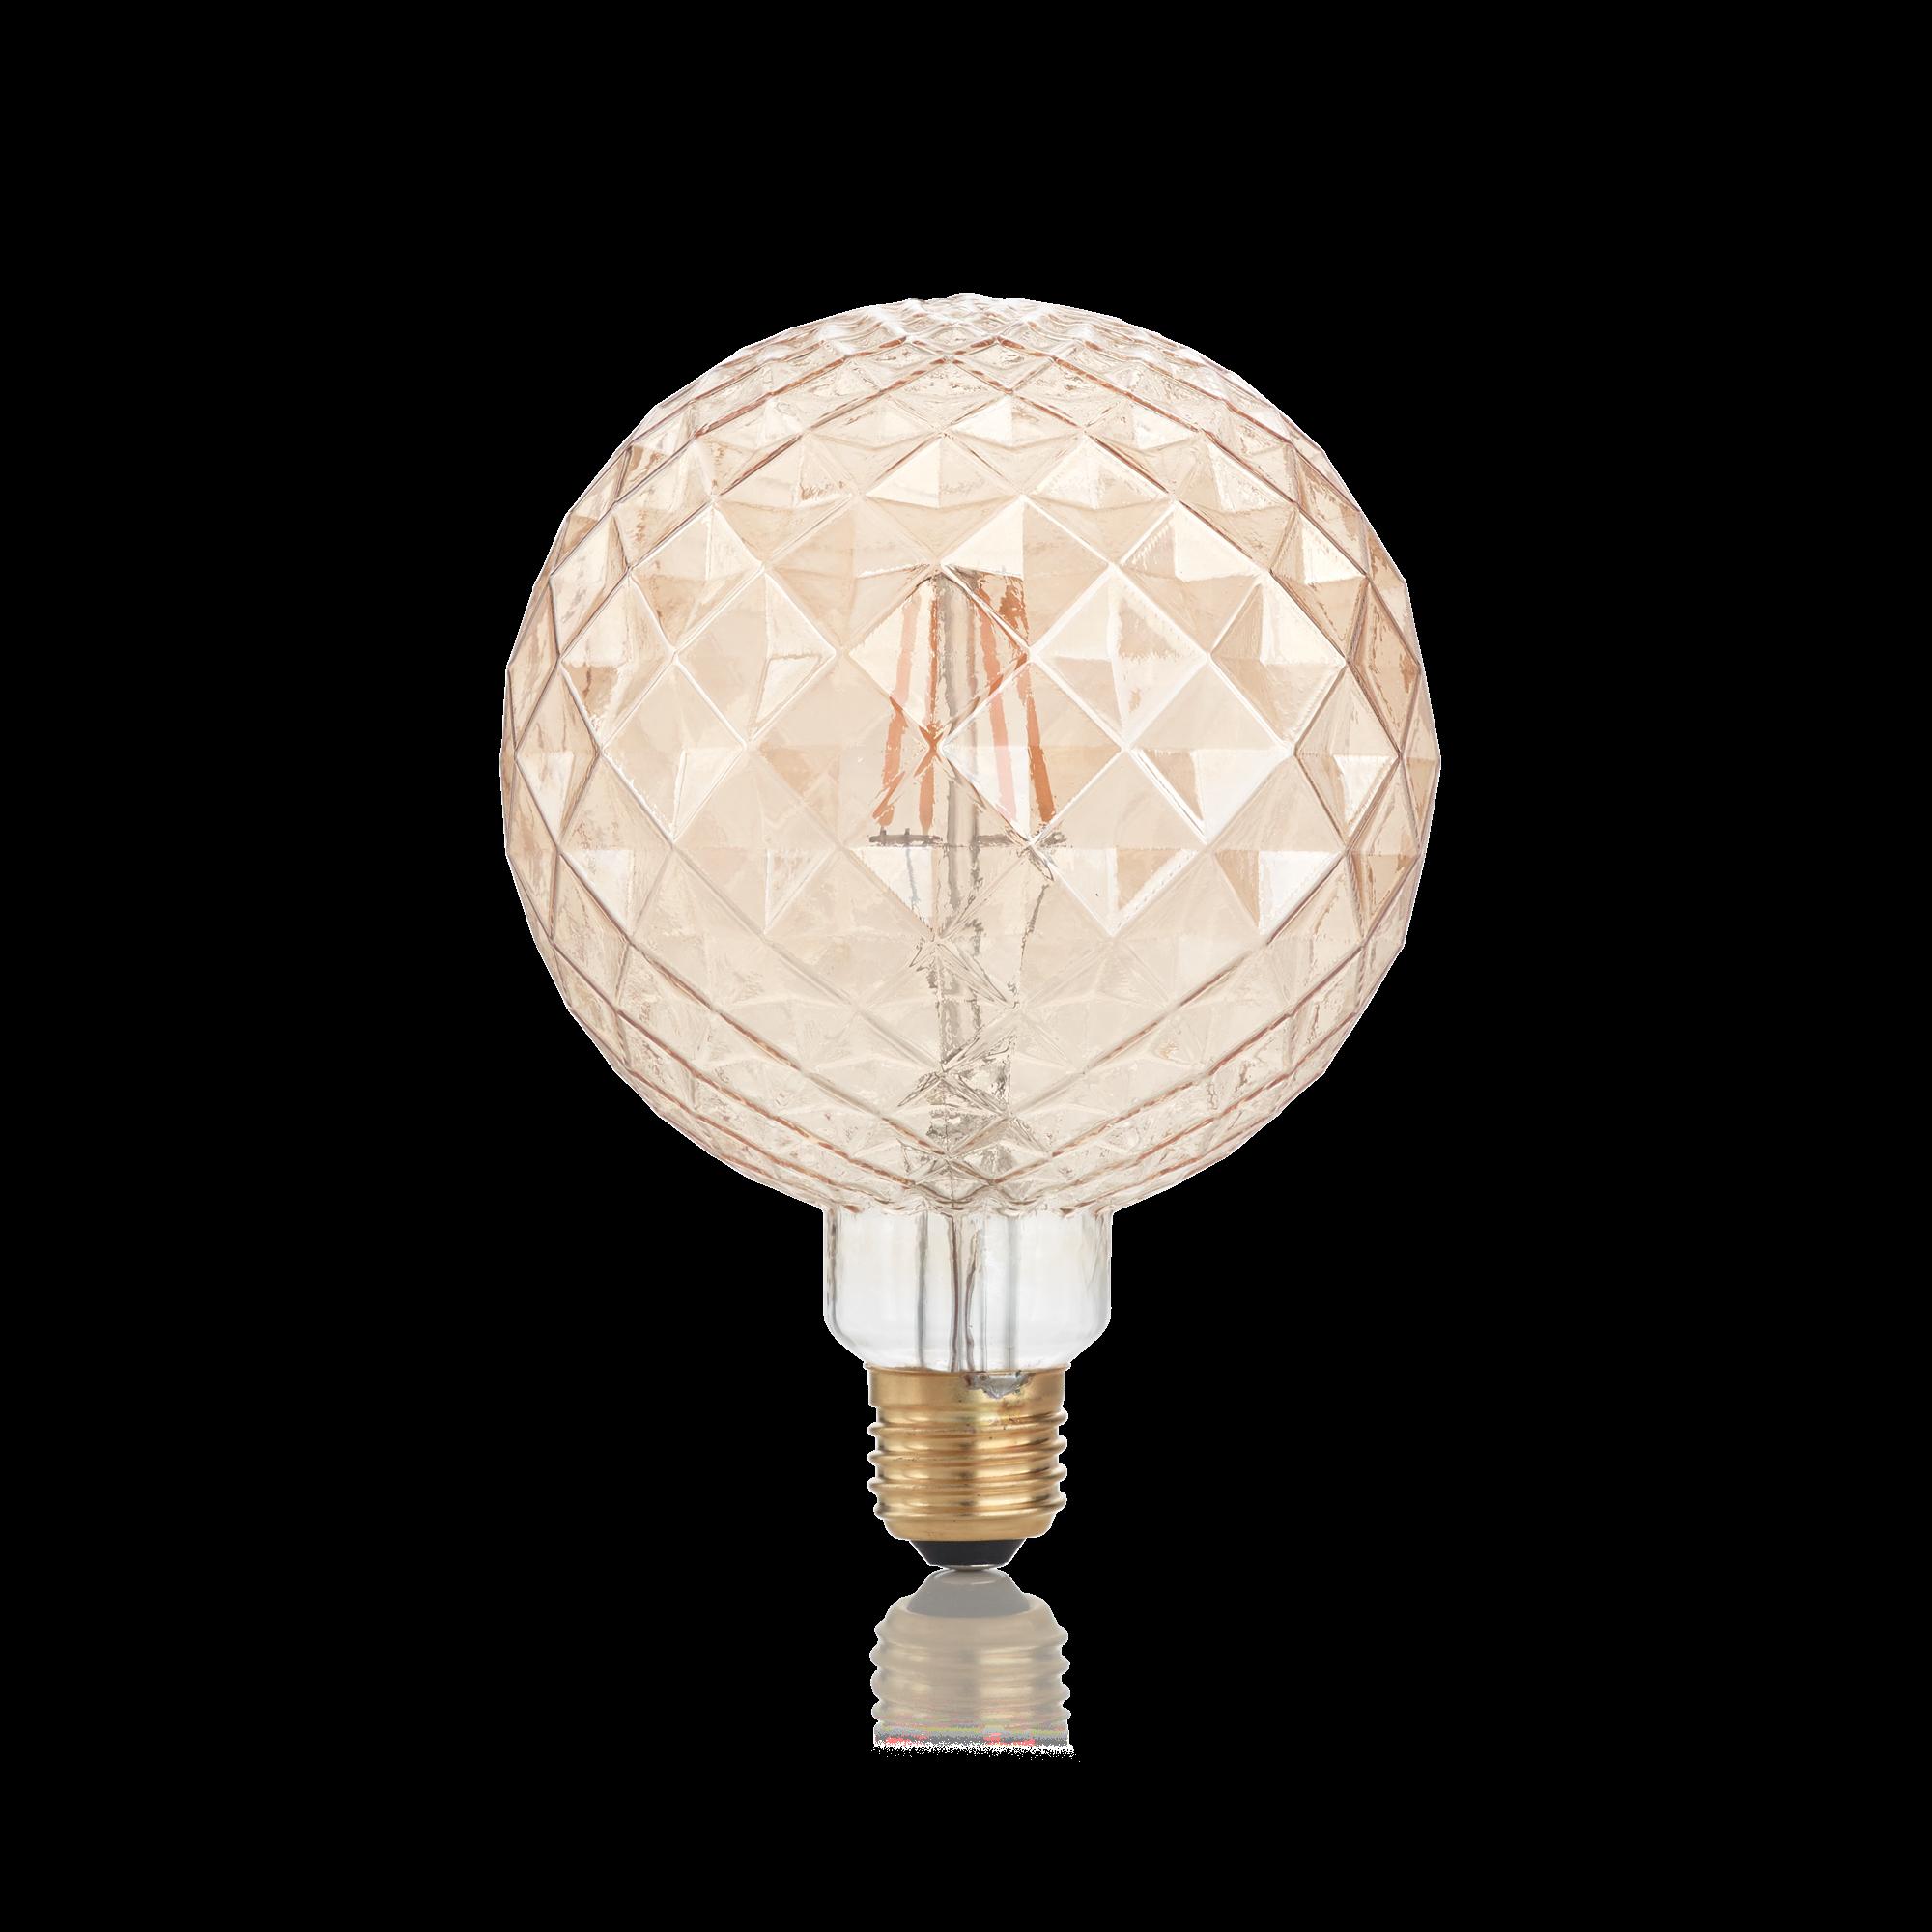 Светодиодная лампа Ideal Lux E27 VINTAGE 04W PEARL AMBRA 2200K 201290 (VINTAGE E27 4W PEARL 2200K) шар малый E27 4W (теплый) - фото 1